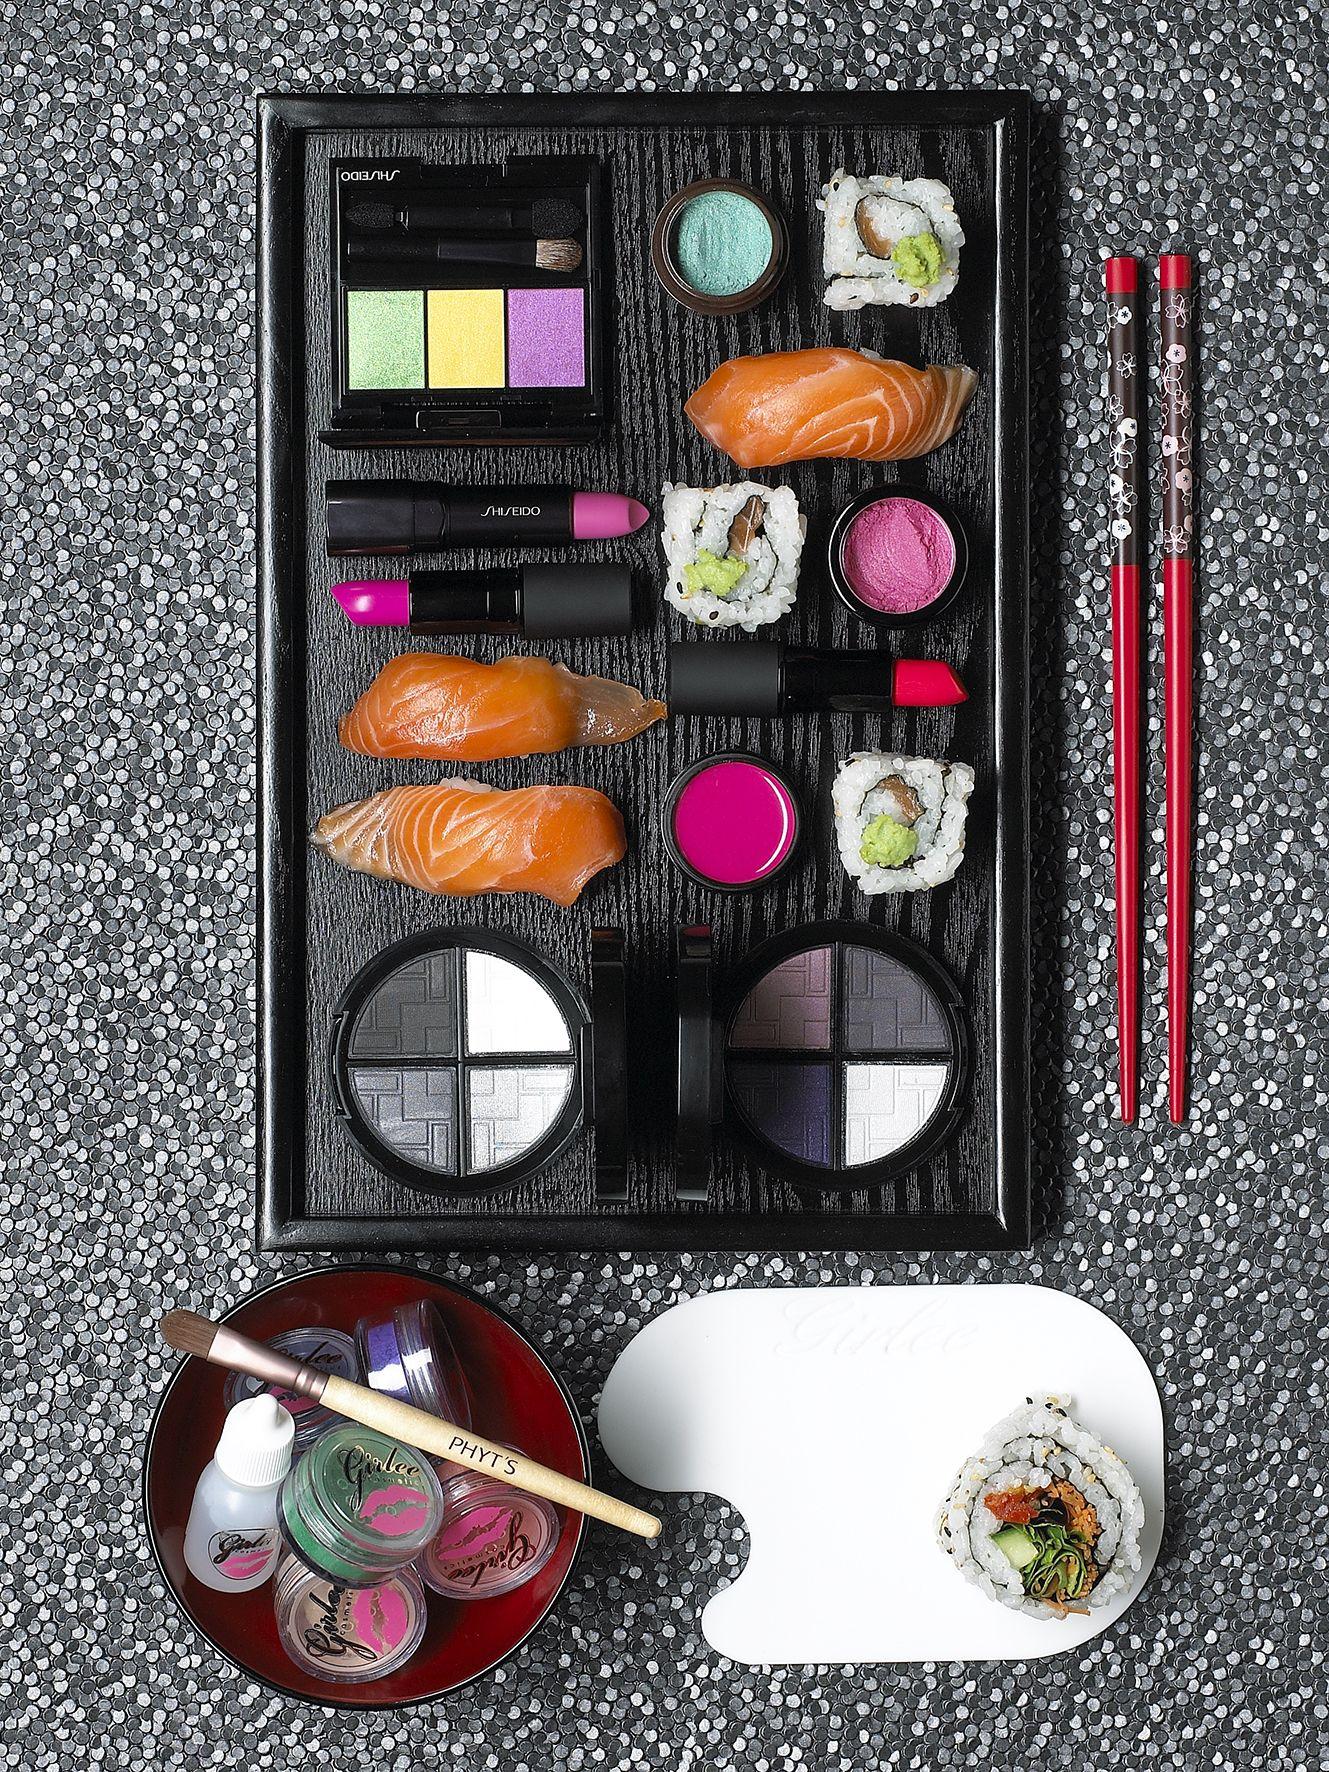 Sushi Bento Box Inspired Makeup Shoot Make Up Photography By. Chc40 Travel  Makeup Anese Sushi Cosmetic Case Organizer Portable Artist Storage Bag  Toiletry ... 6331afa20671b